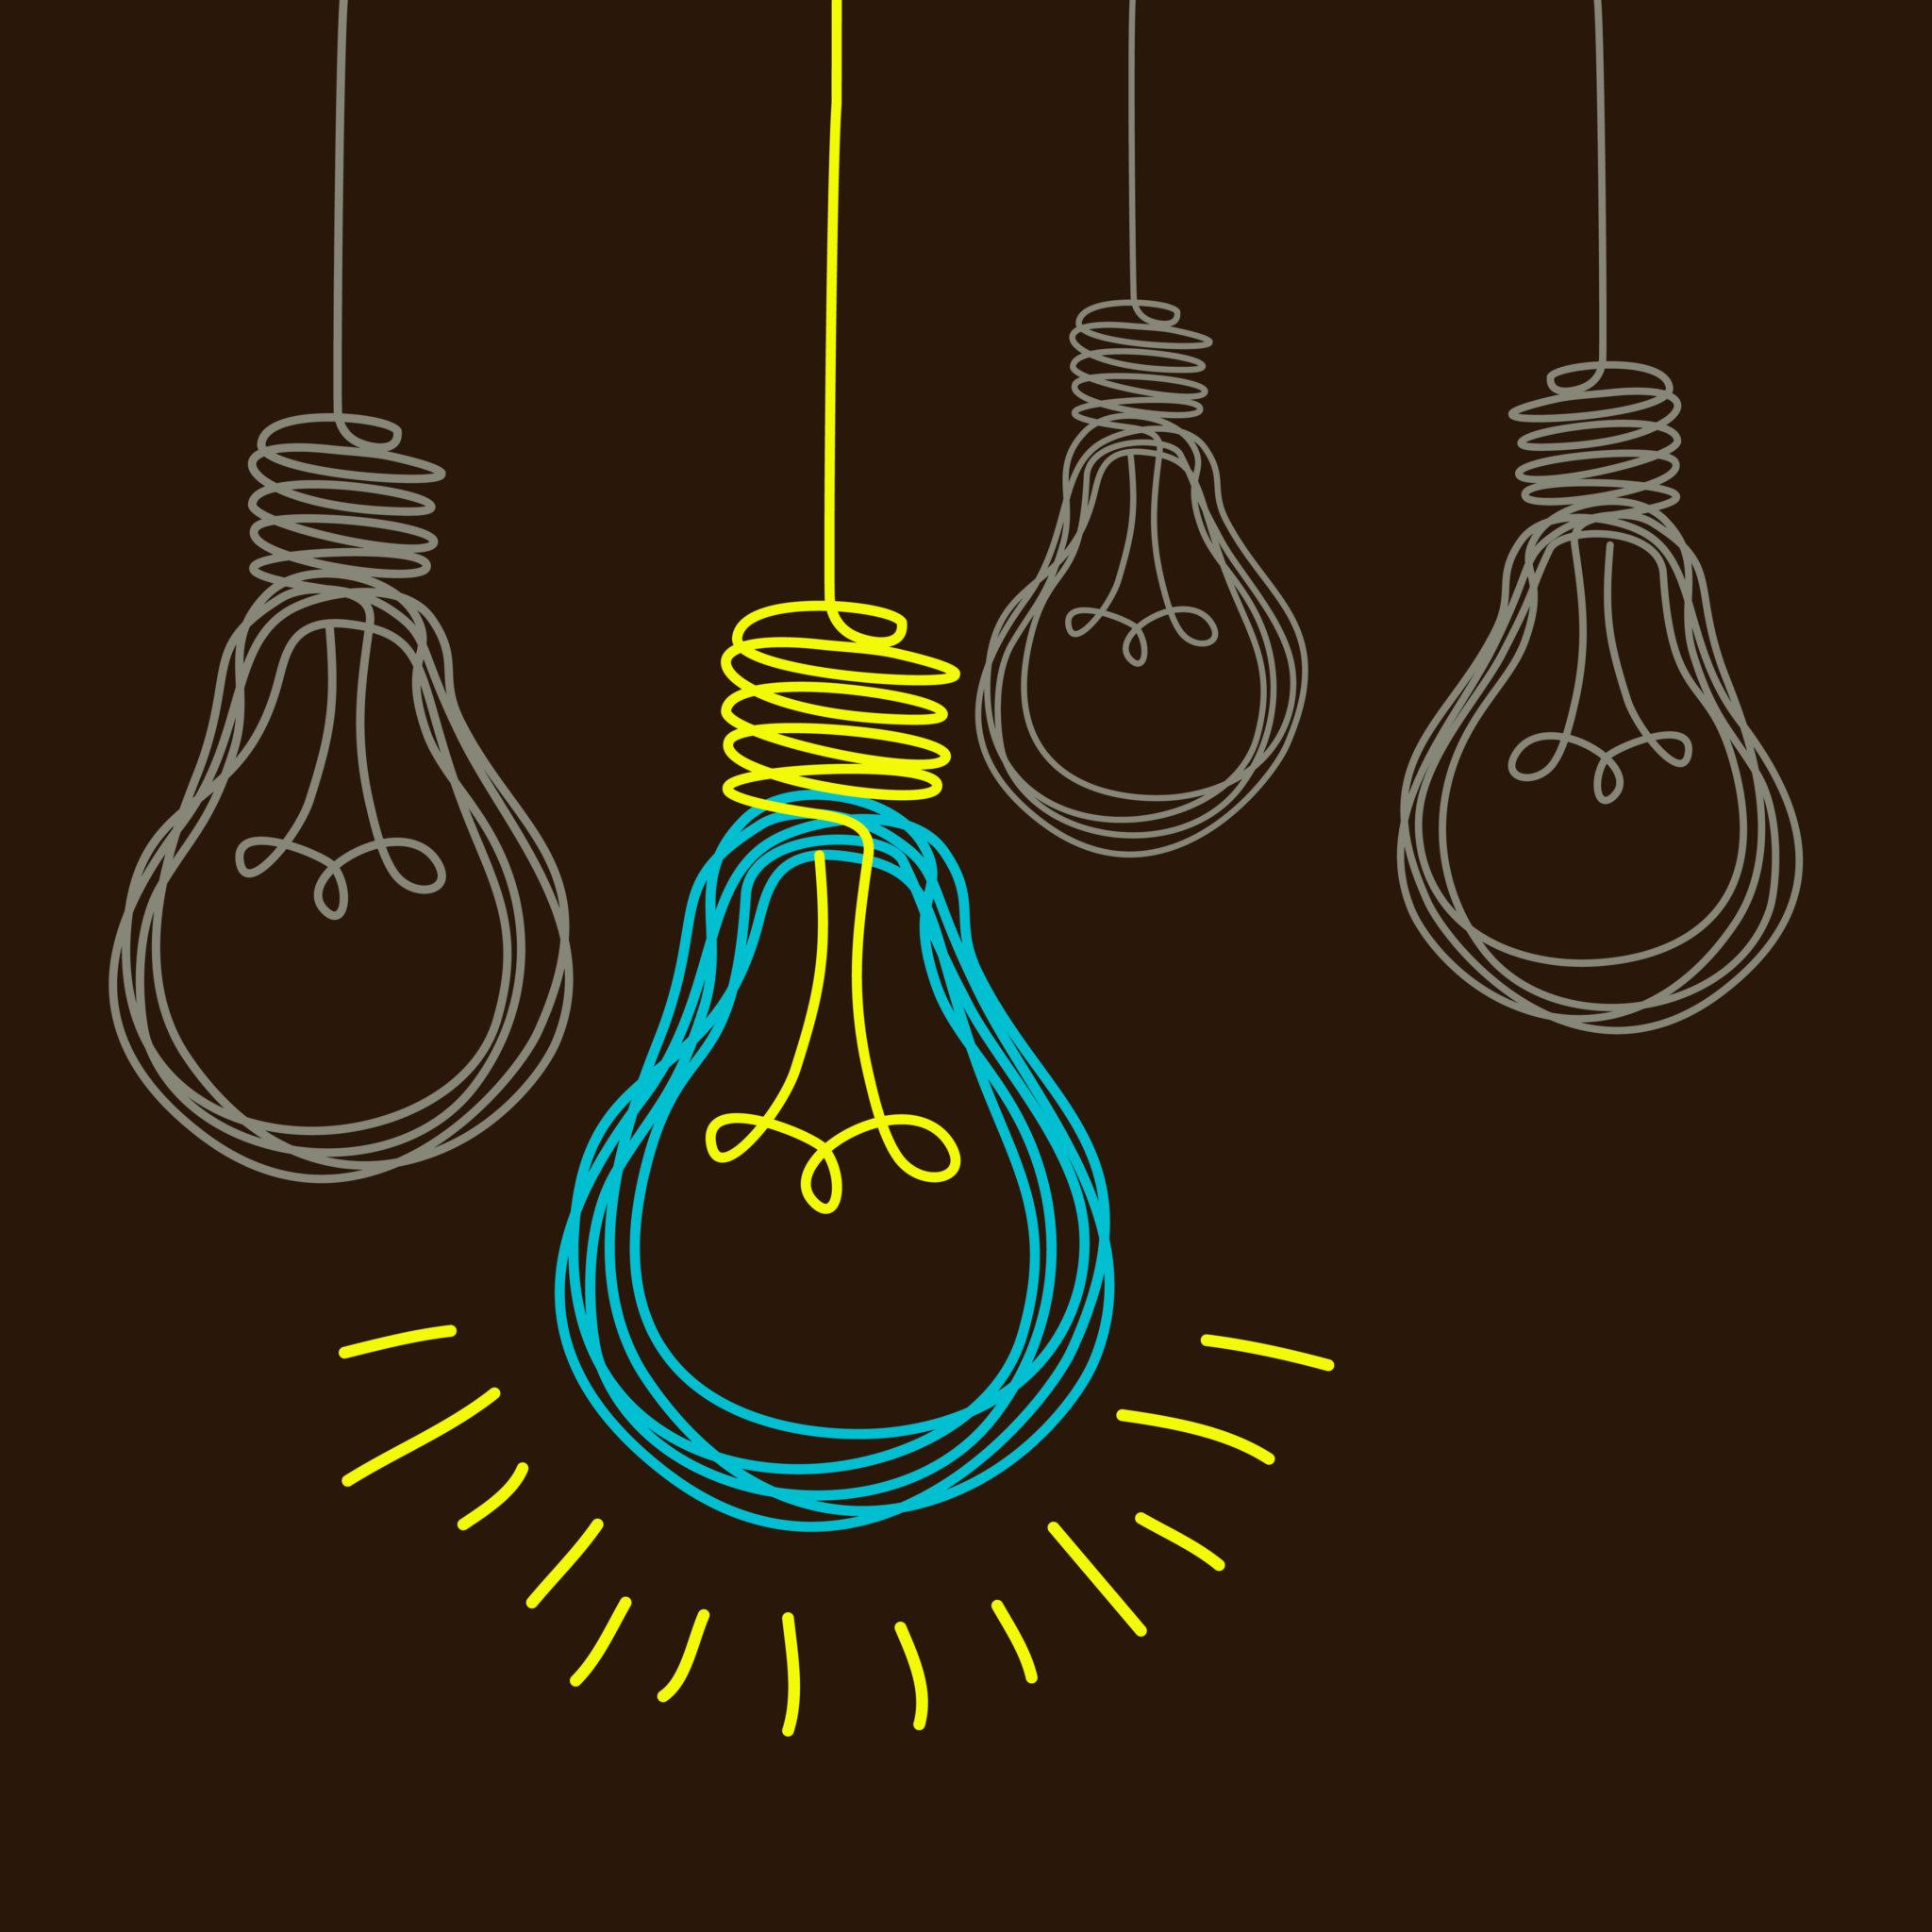 Genius Hour Shines At Krimmel